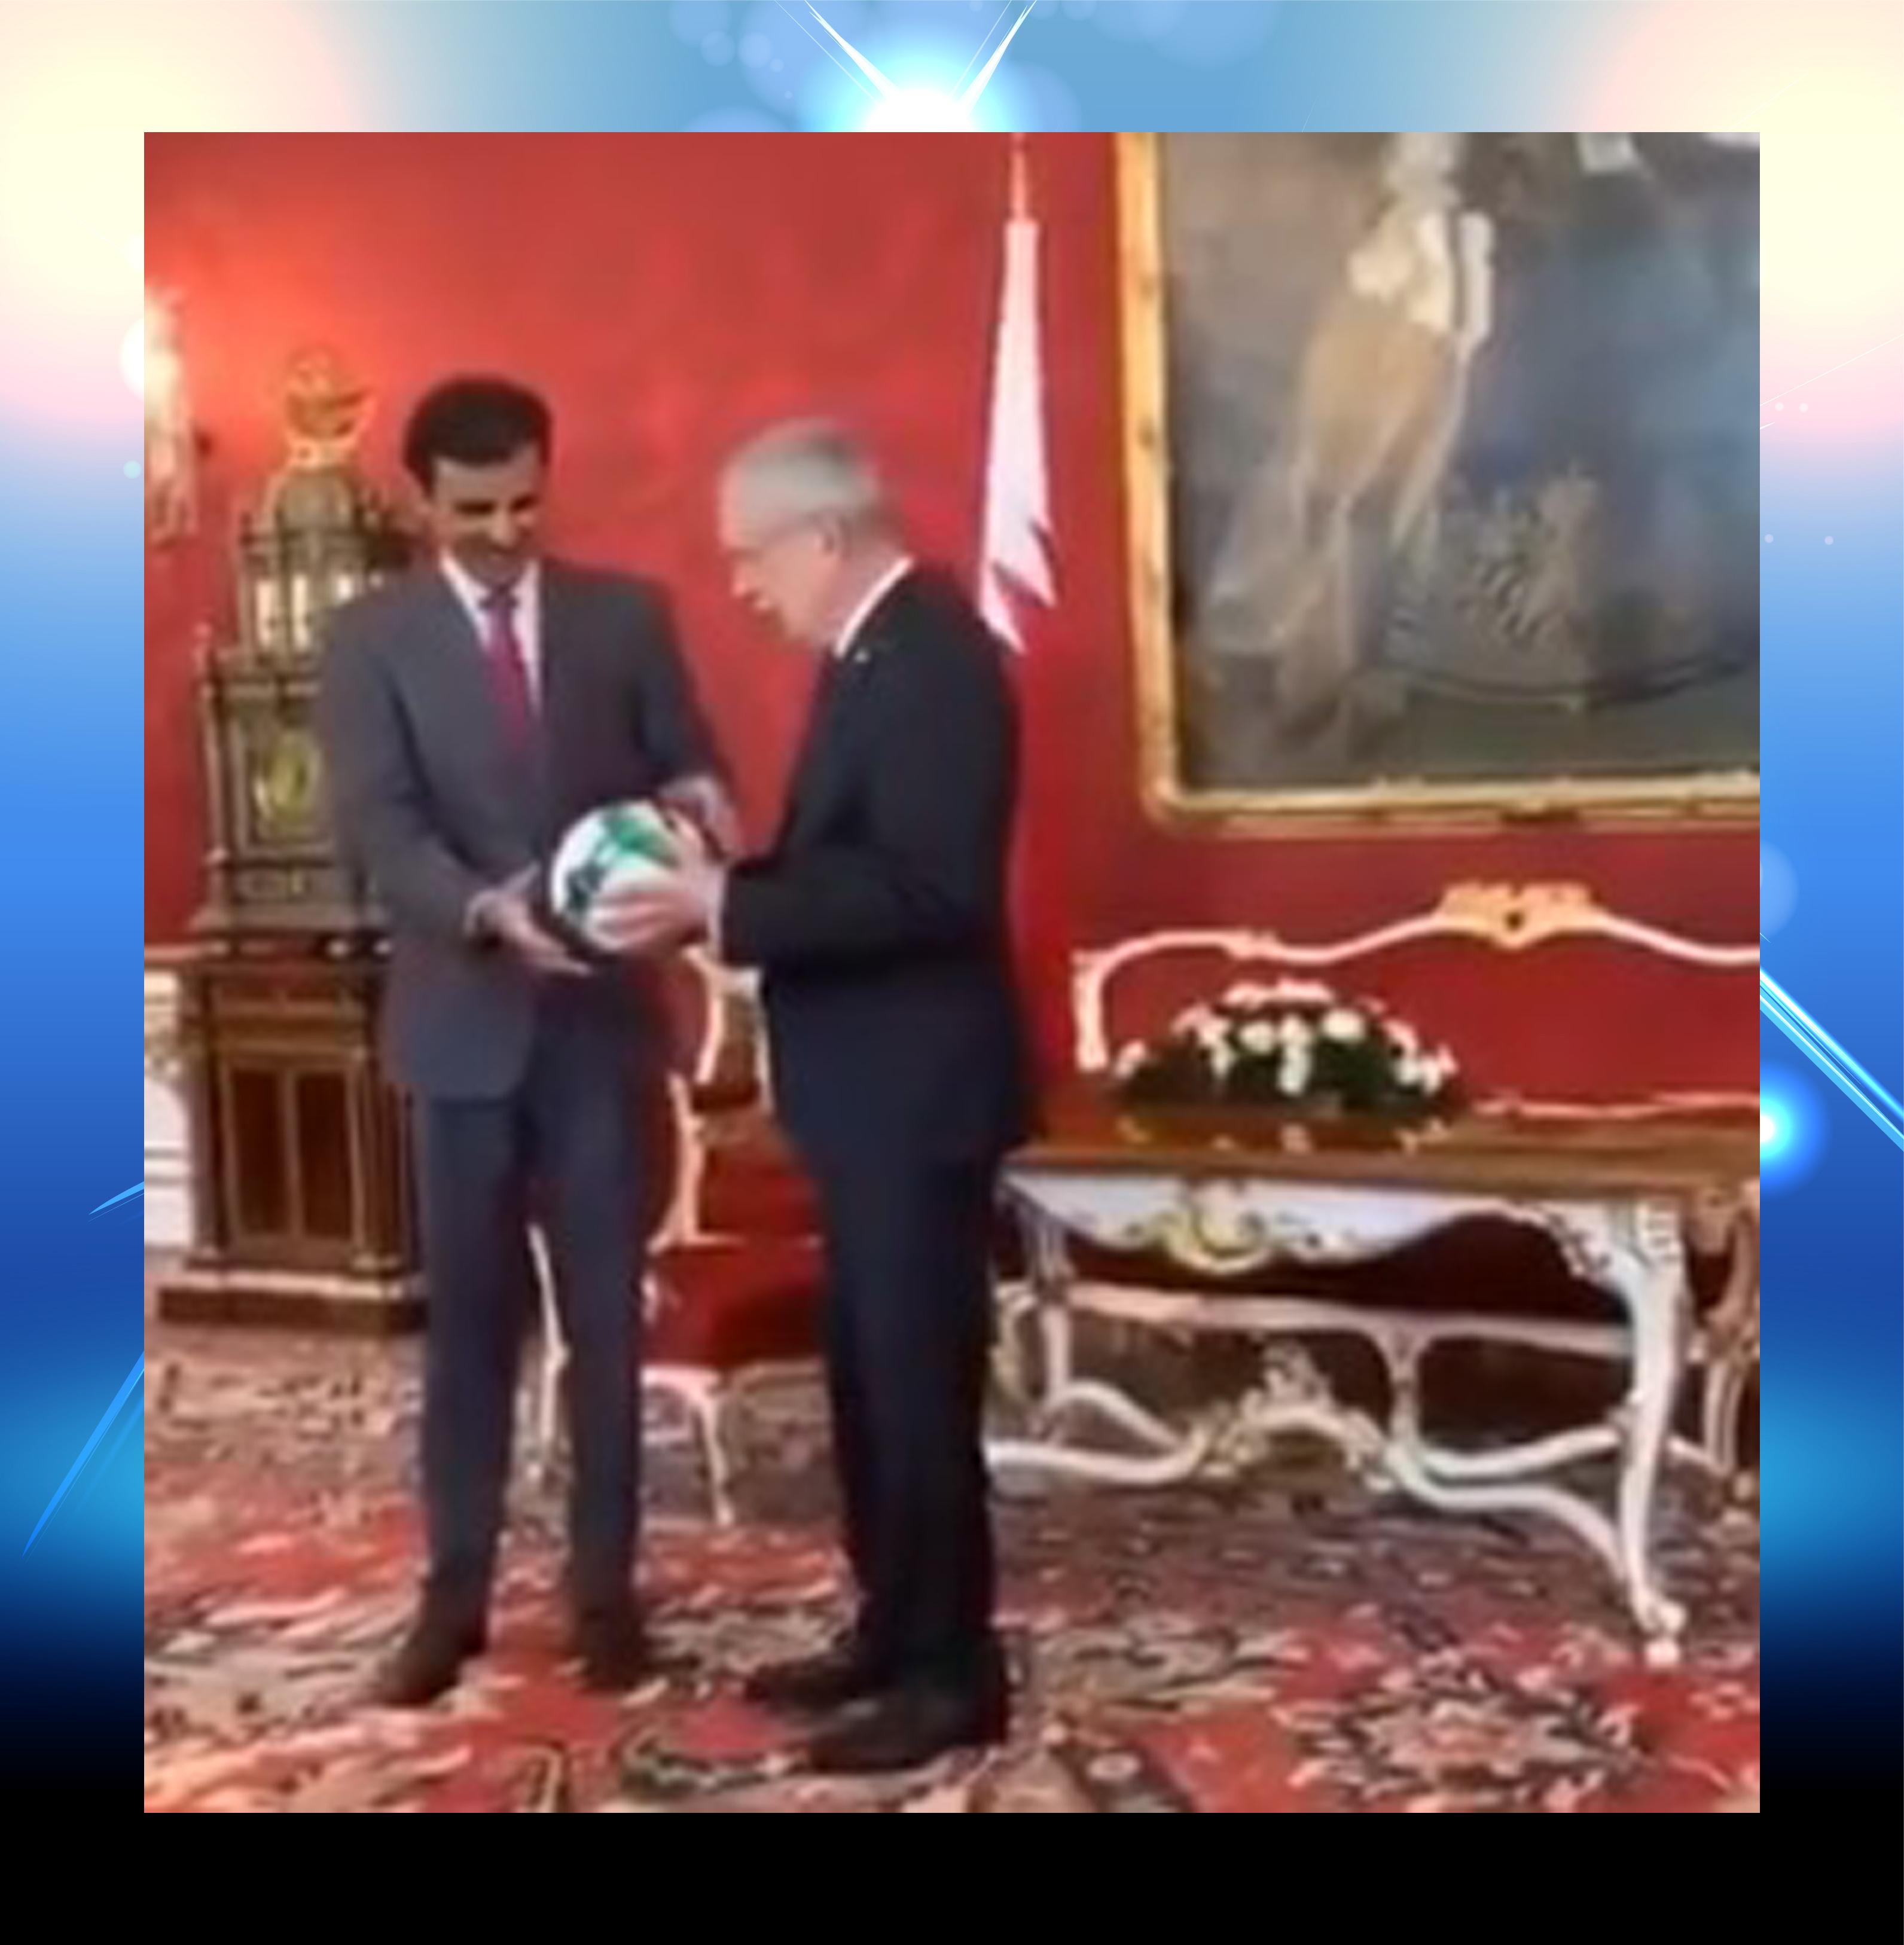 Photo of فيديو: الرئيس النمساوى يهدى امير قطر كرة قدم..فما هى المناسبة؟